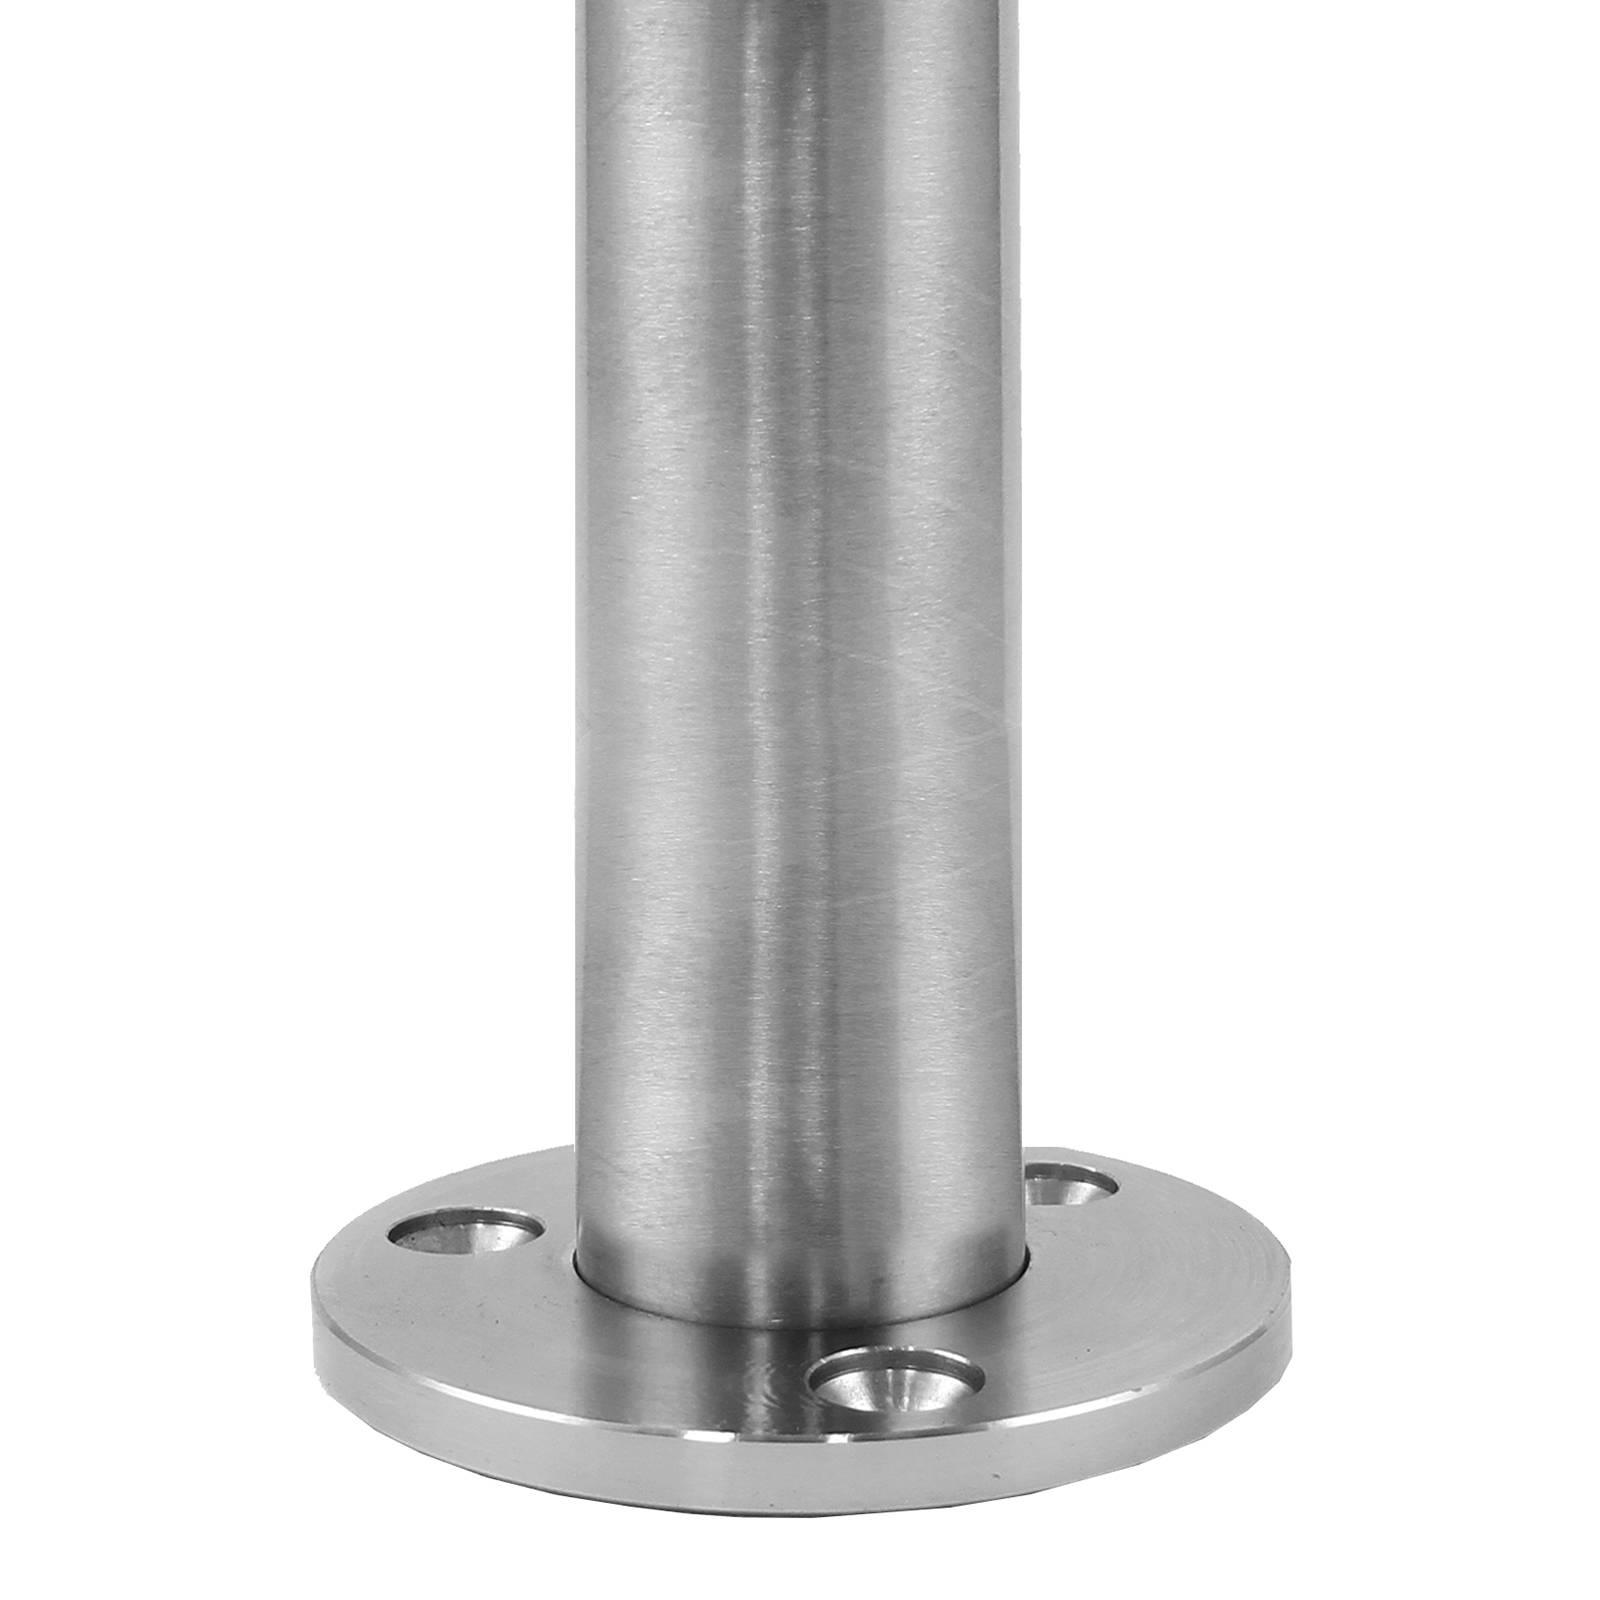 Stainless Steel Safandarley Metalworking Mexico: Brushed Metal Balustrade Stainless Steel End Post Decking